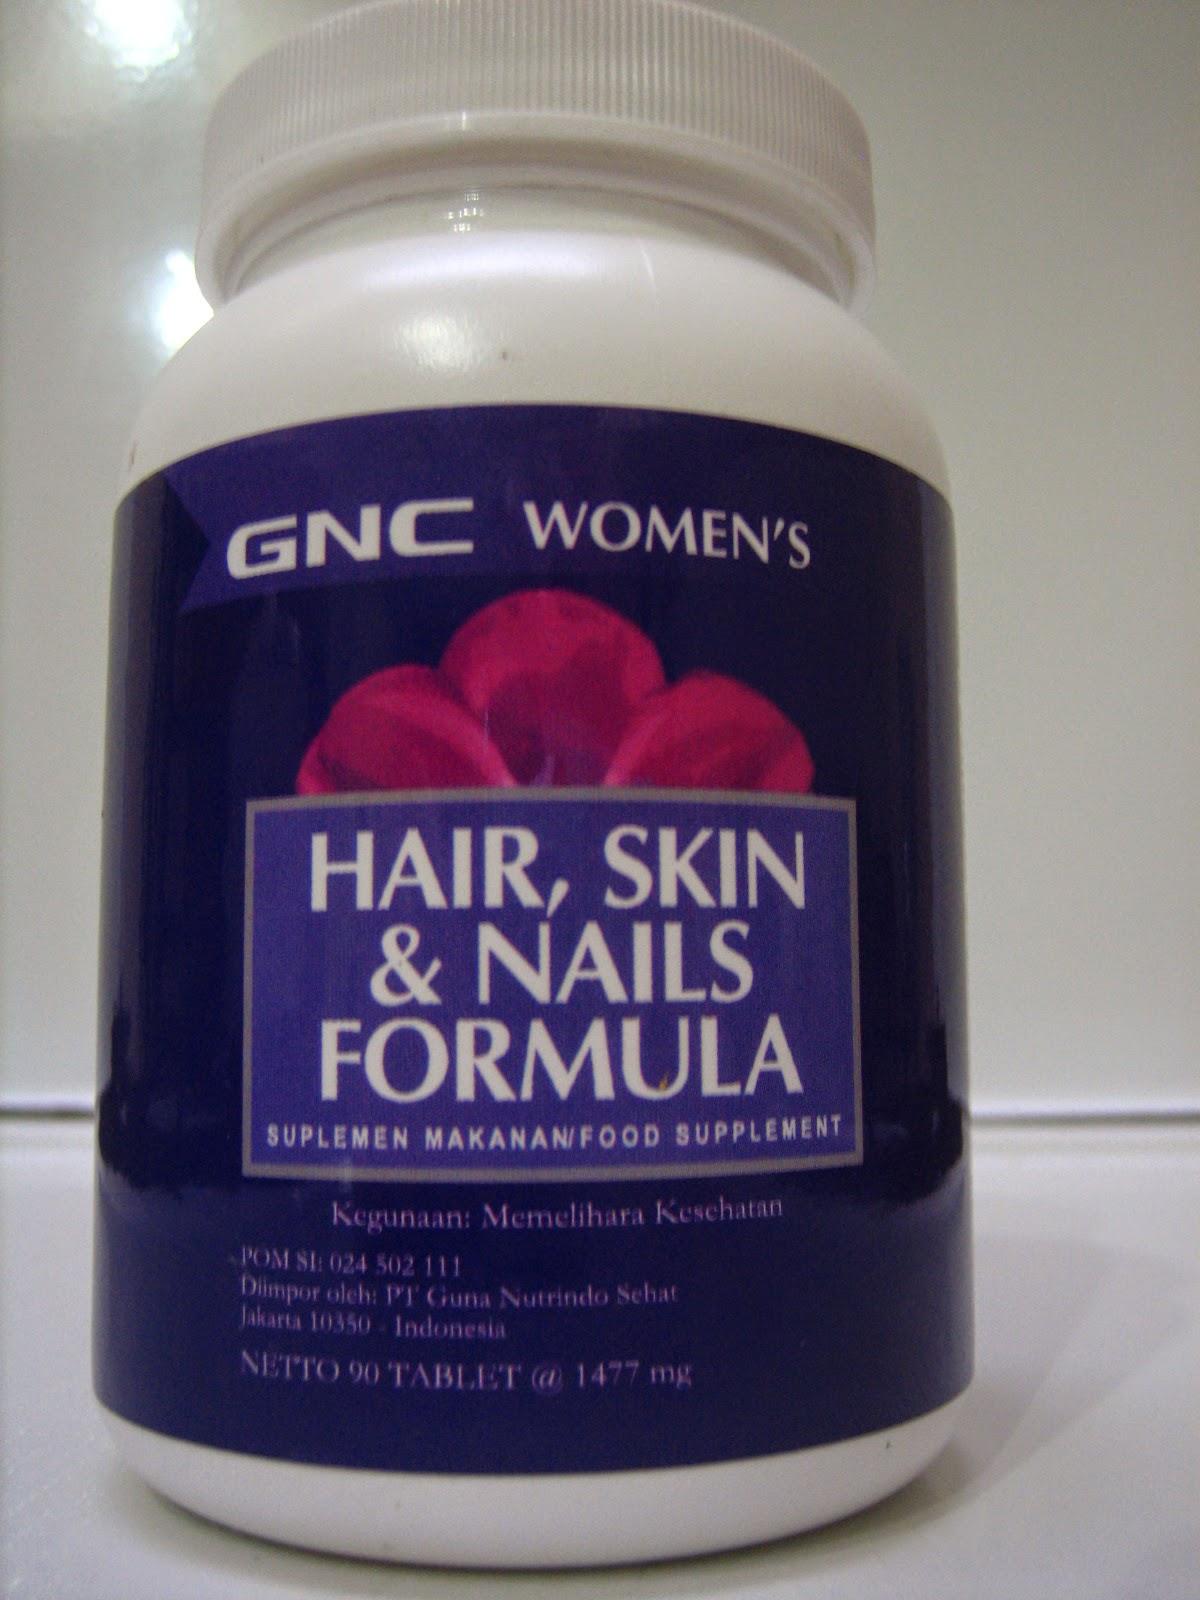 Gnc Women S Hair Skin Nails Formula